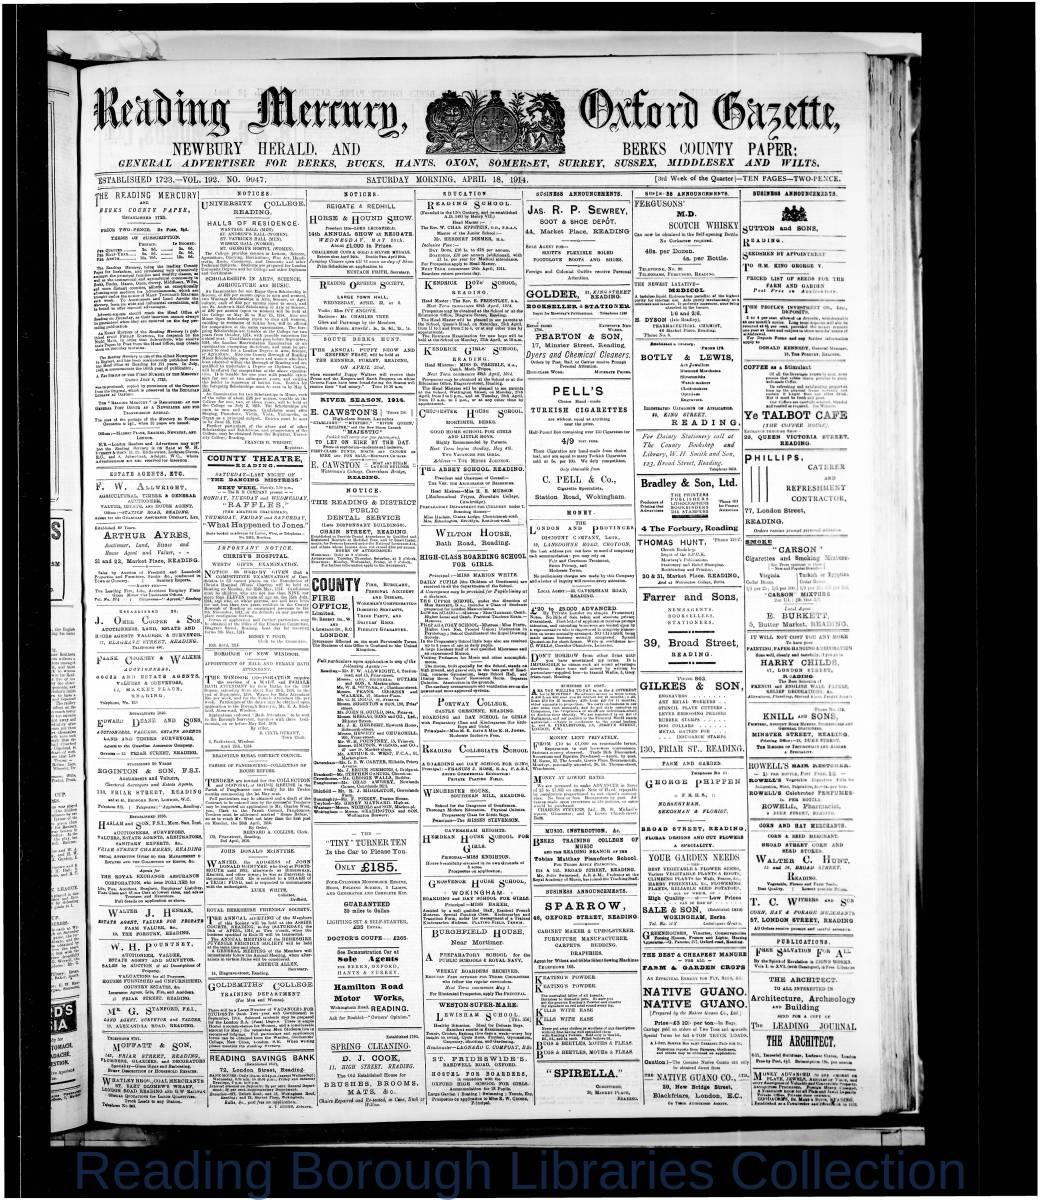 Reading Mercury Oxford Gazett Saturday, April 18, 1914. Pg 1